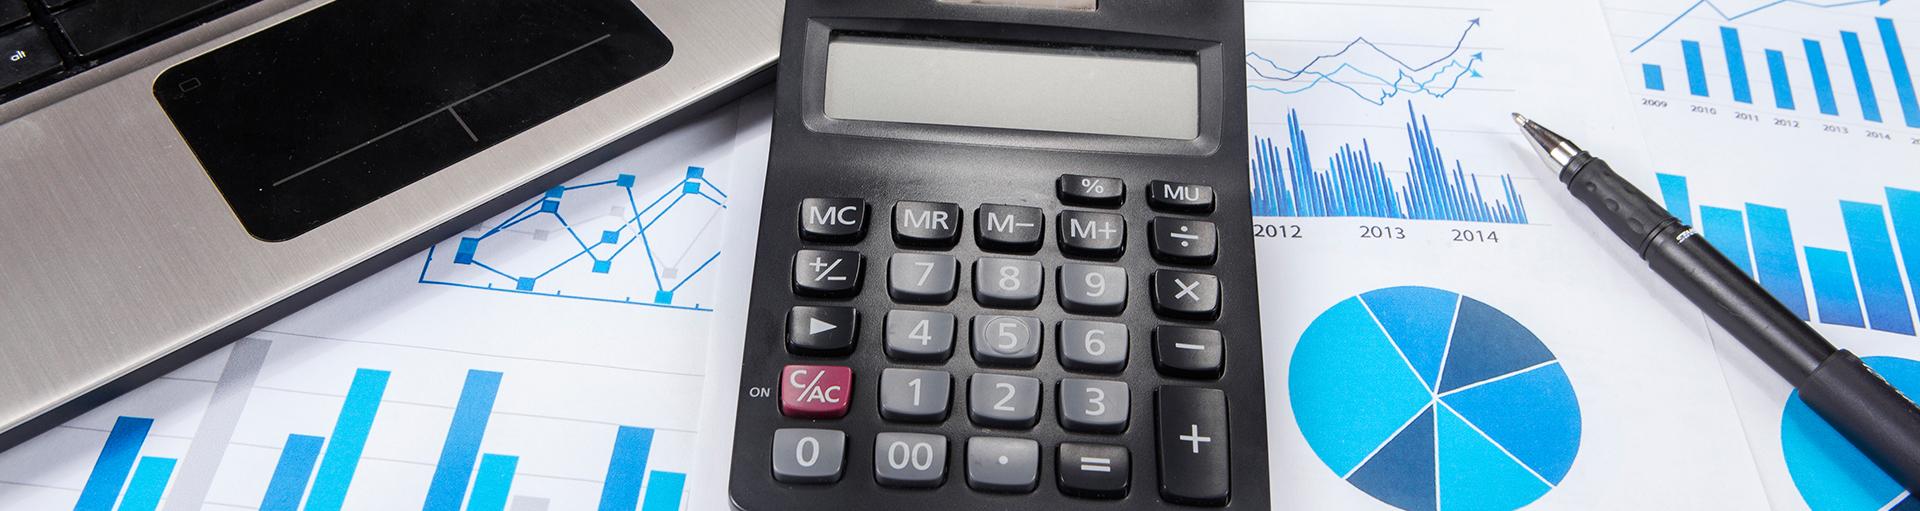 GF Sheridan & Co Accountants Glasgow 01419 548219